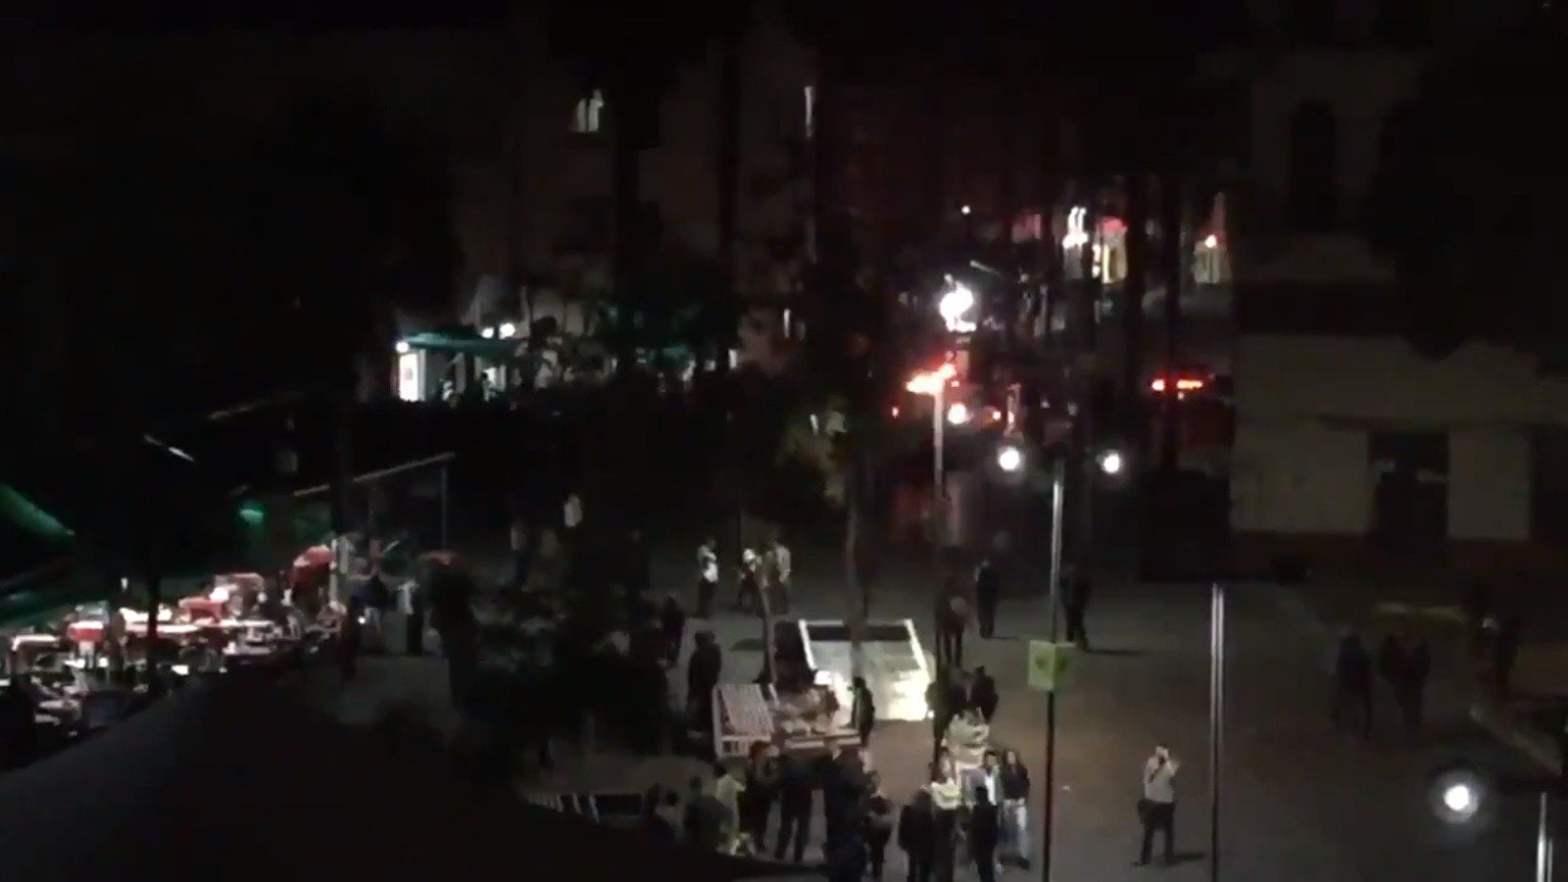 Balacera en Plaza Garibaldi deja tres muertos